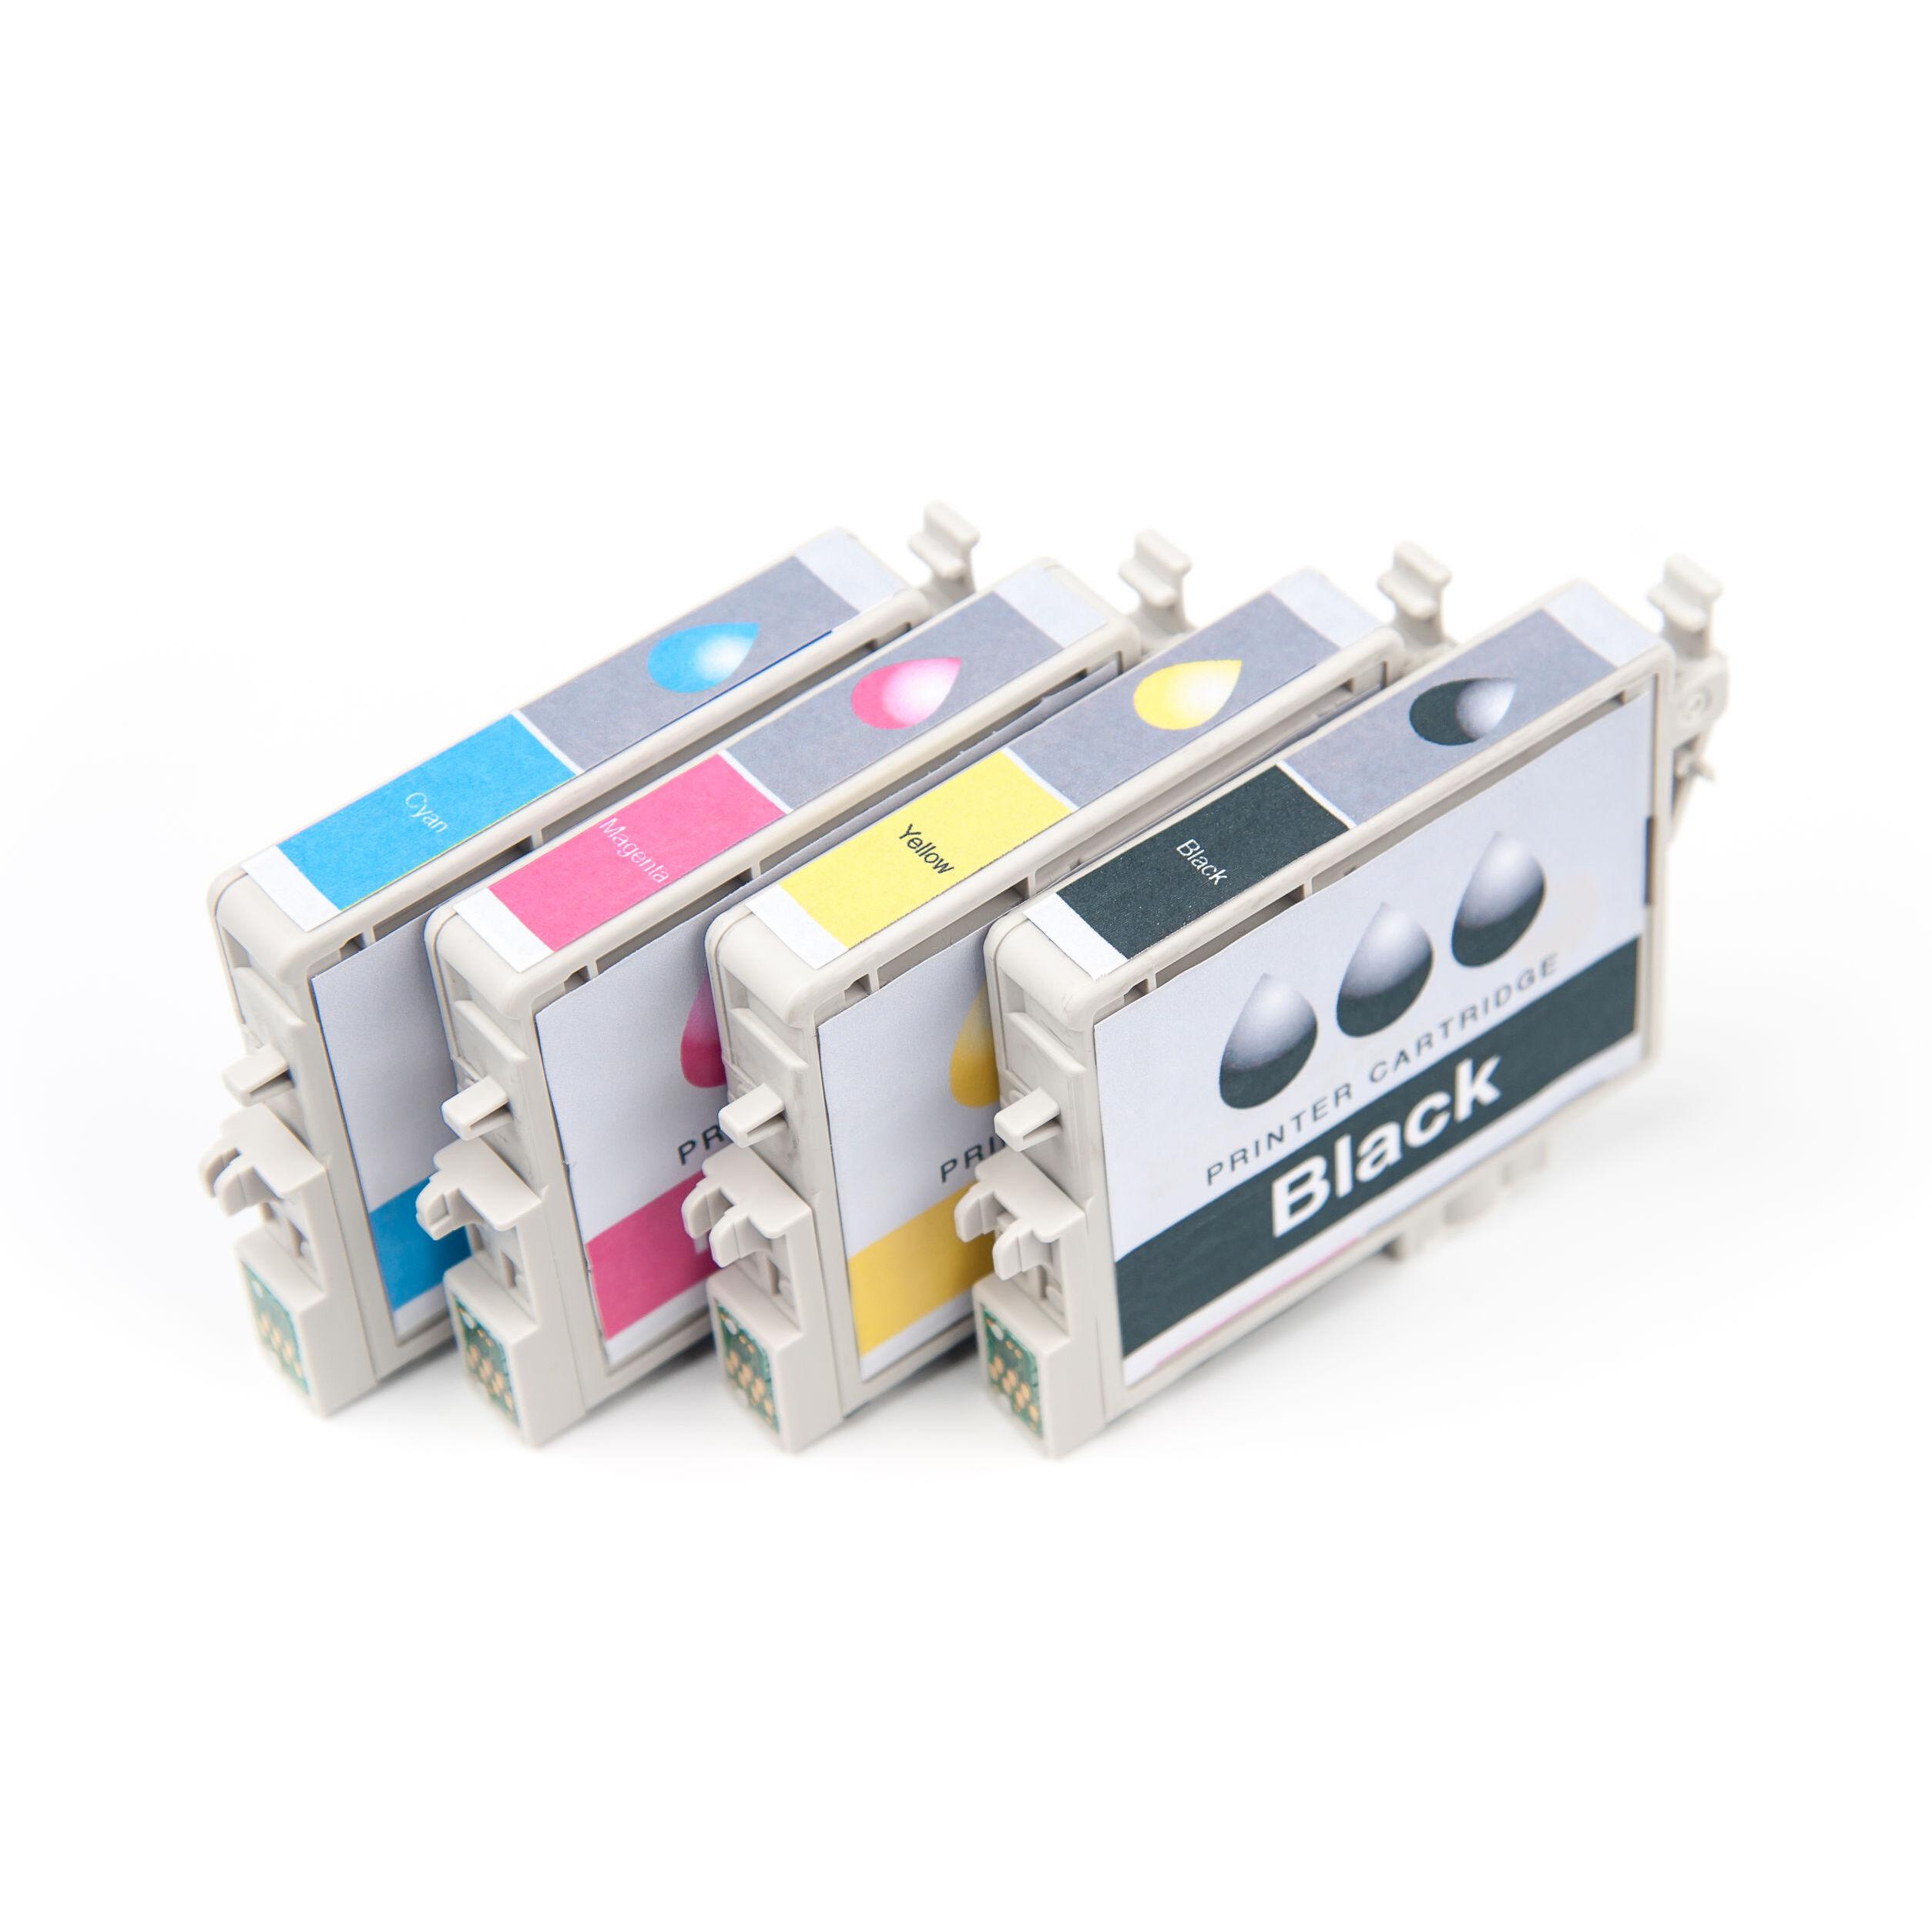 HP Originale PhotoSmart C 5390 Cartuccia stampante (364XL / N9J74AE#301) multicolor Multipack (4 pz.), Contenuto: 1x 550pg 3x 750pg